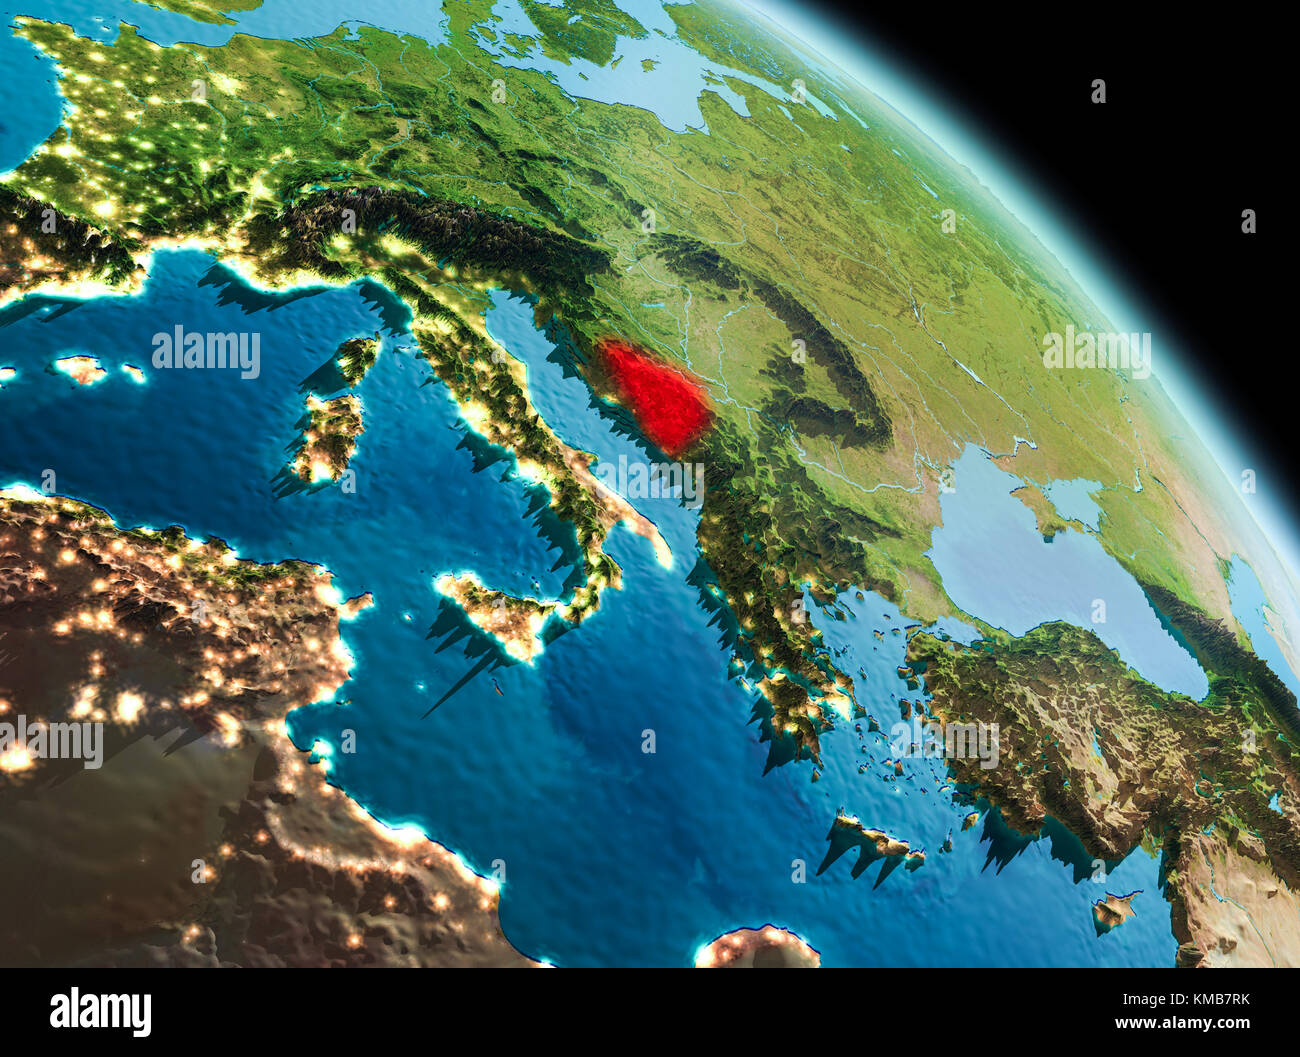 Por La Mañana Vista Satelital De Bosnia Y Herzegovina Resaltada En